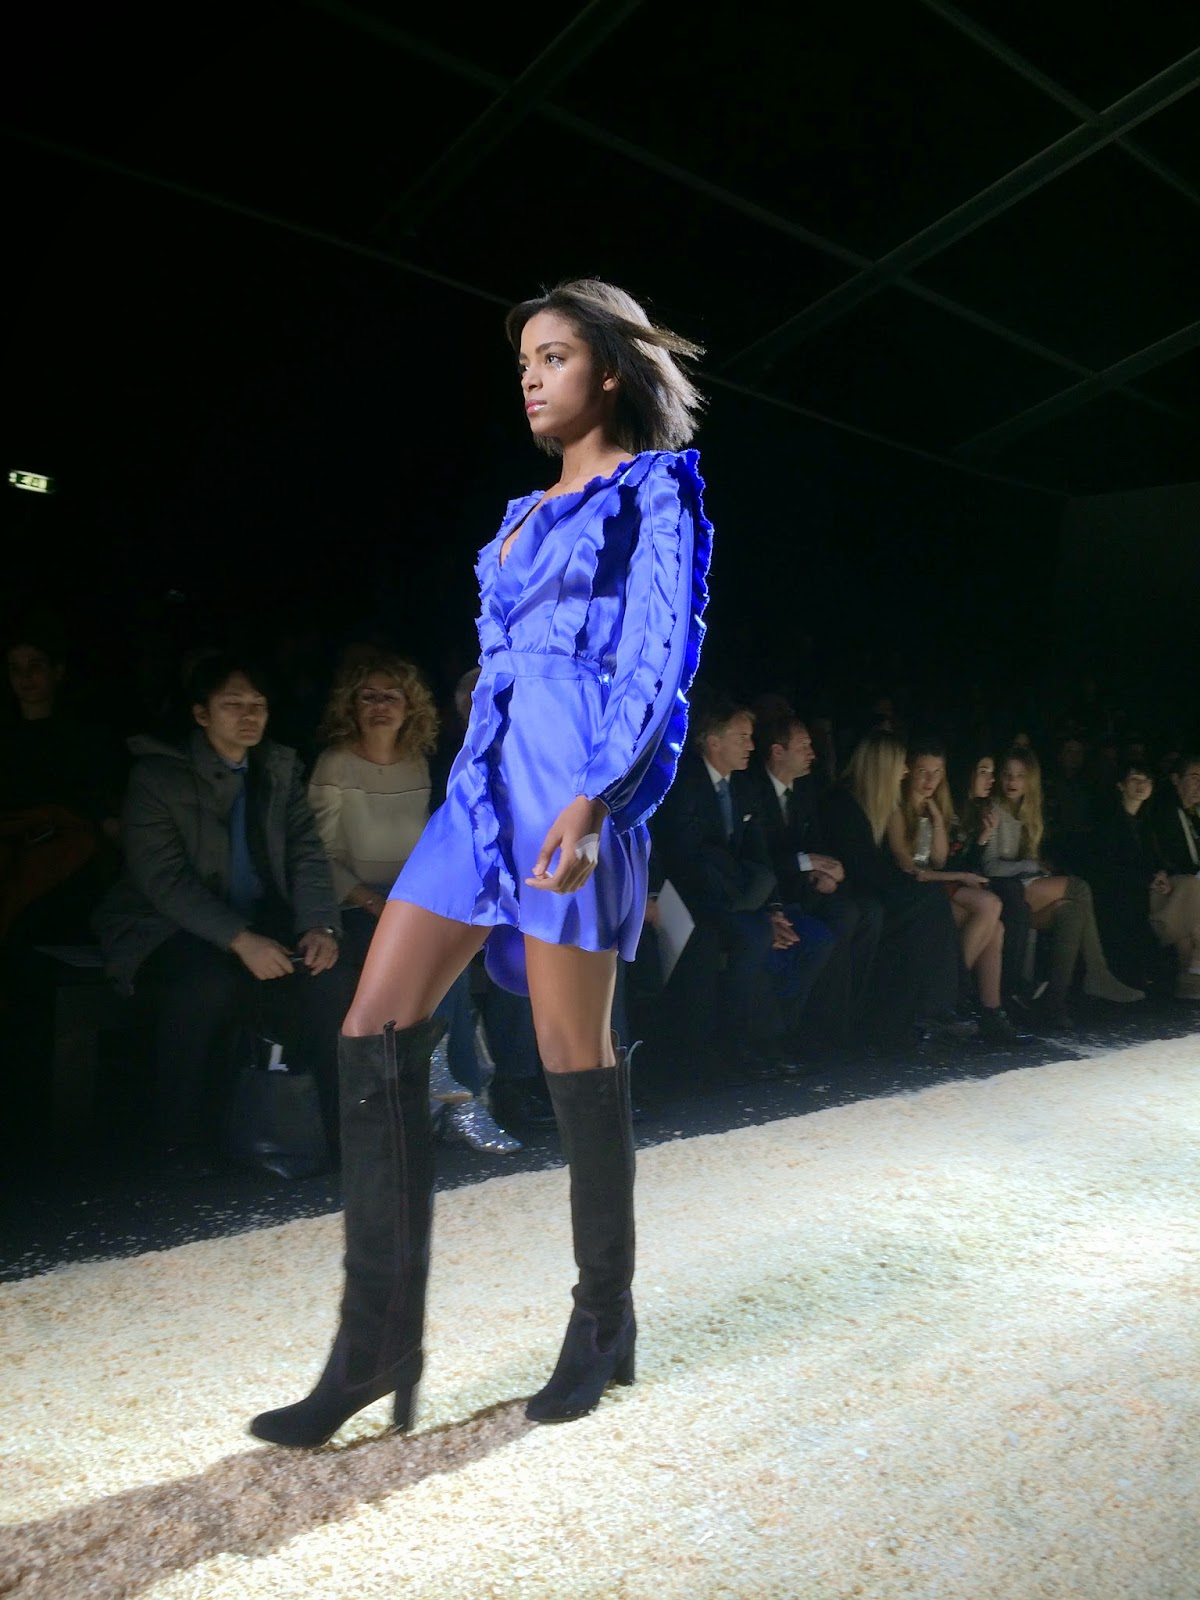 best authentic 03f0f 0876c A dream called fashion : MFW day 3: Kristina Ti fashion show